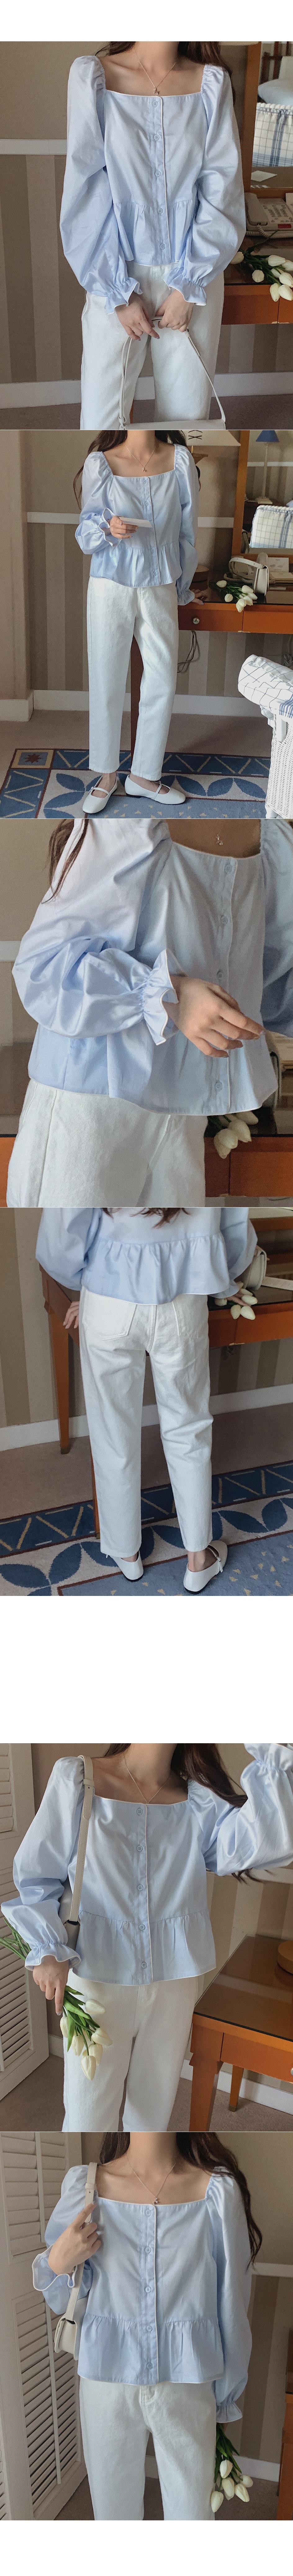 Osley shirred blouse